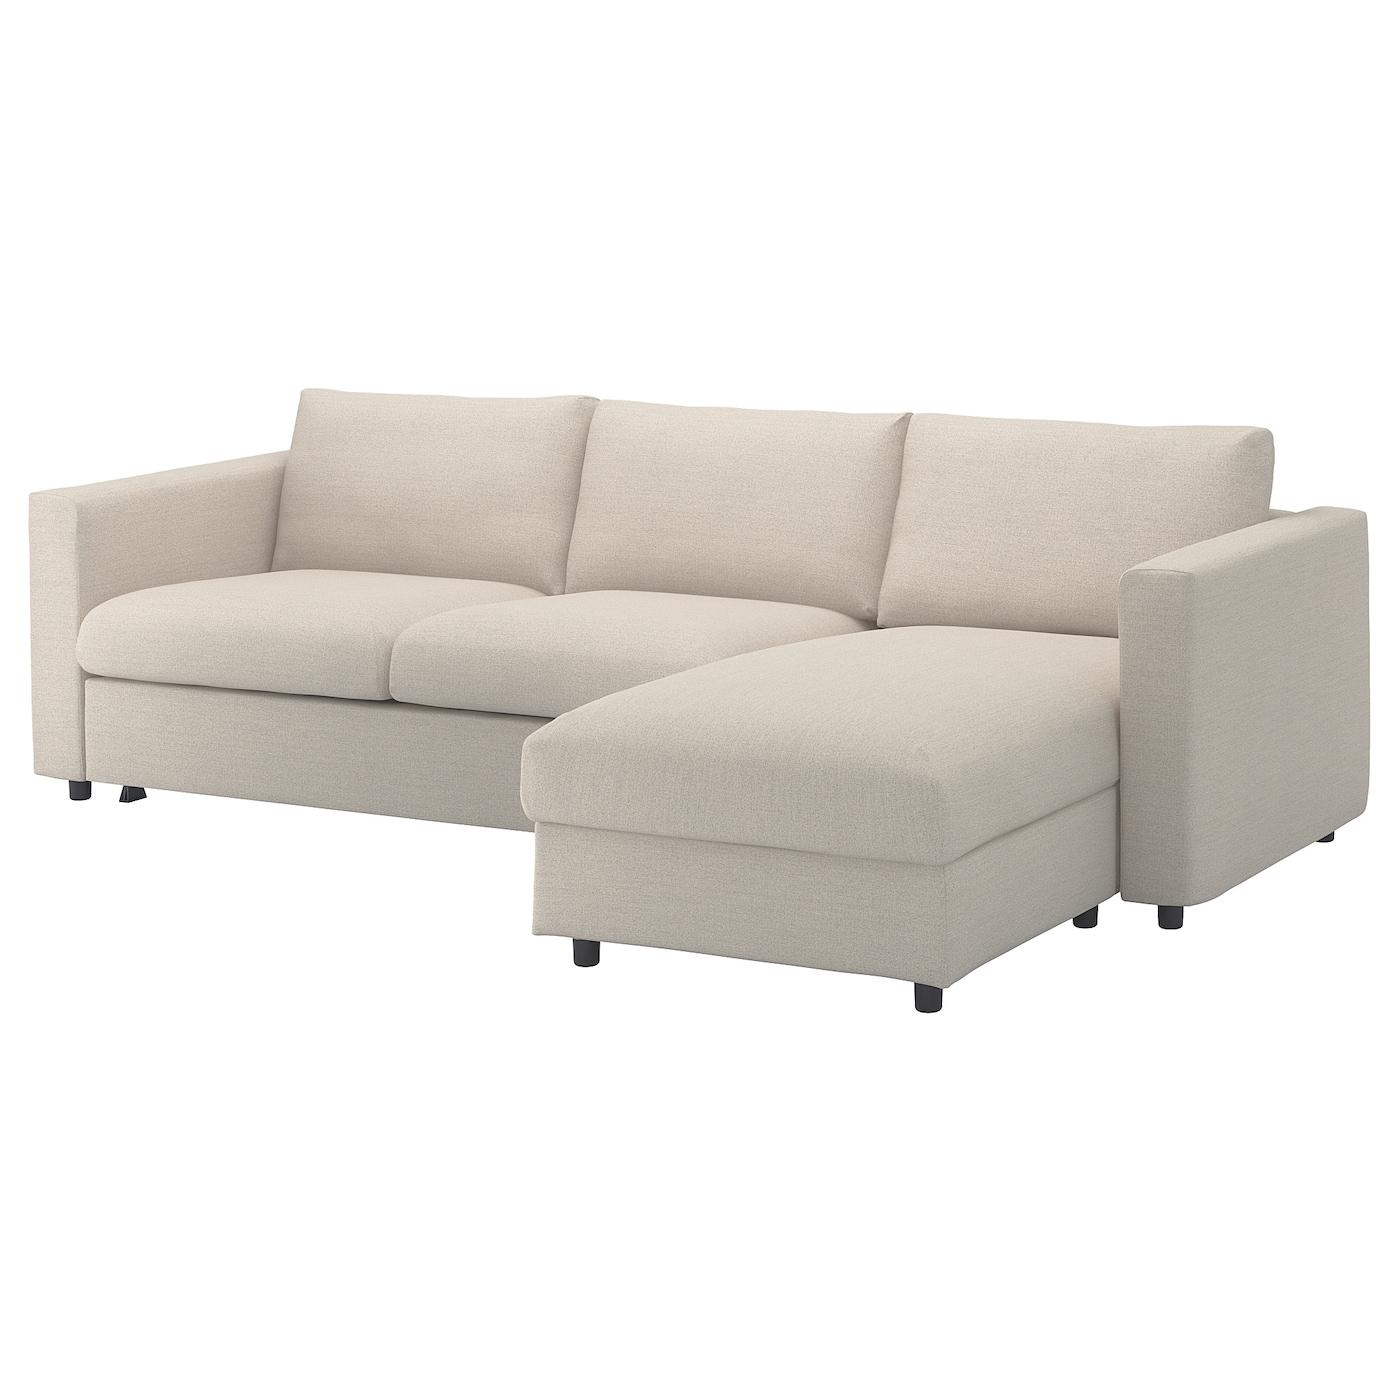 Sleeper Sofa Vimle With Chaise Gunnared Beige